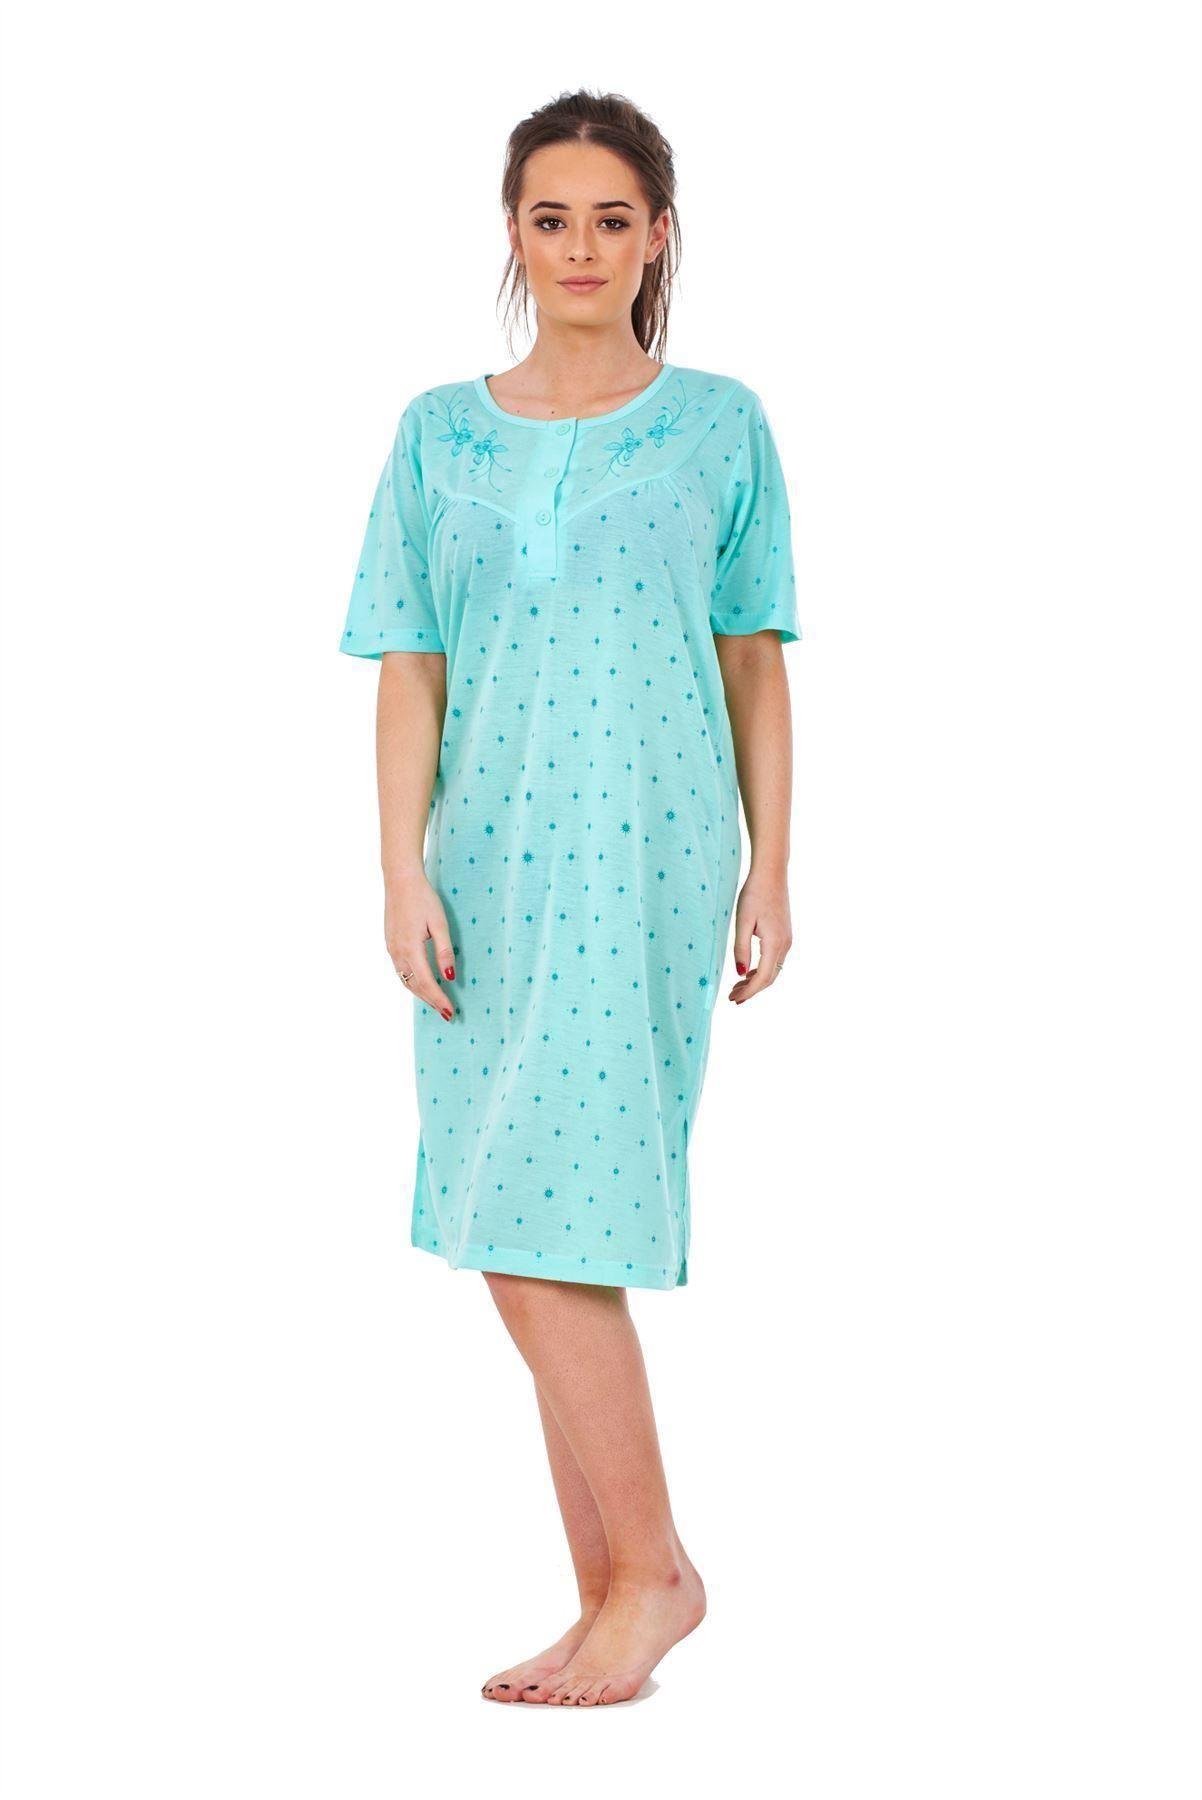 Ladies-Women-Nightwear-Crew-Neck-Button-SUN-Printed-Short-Sleeve-Long-Nightie